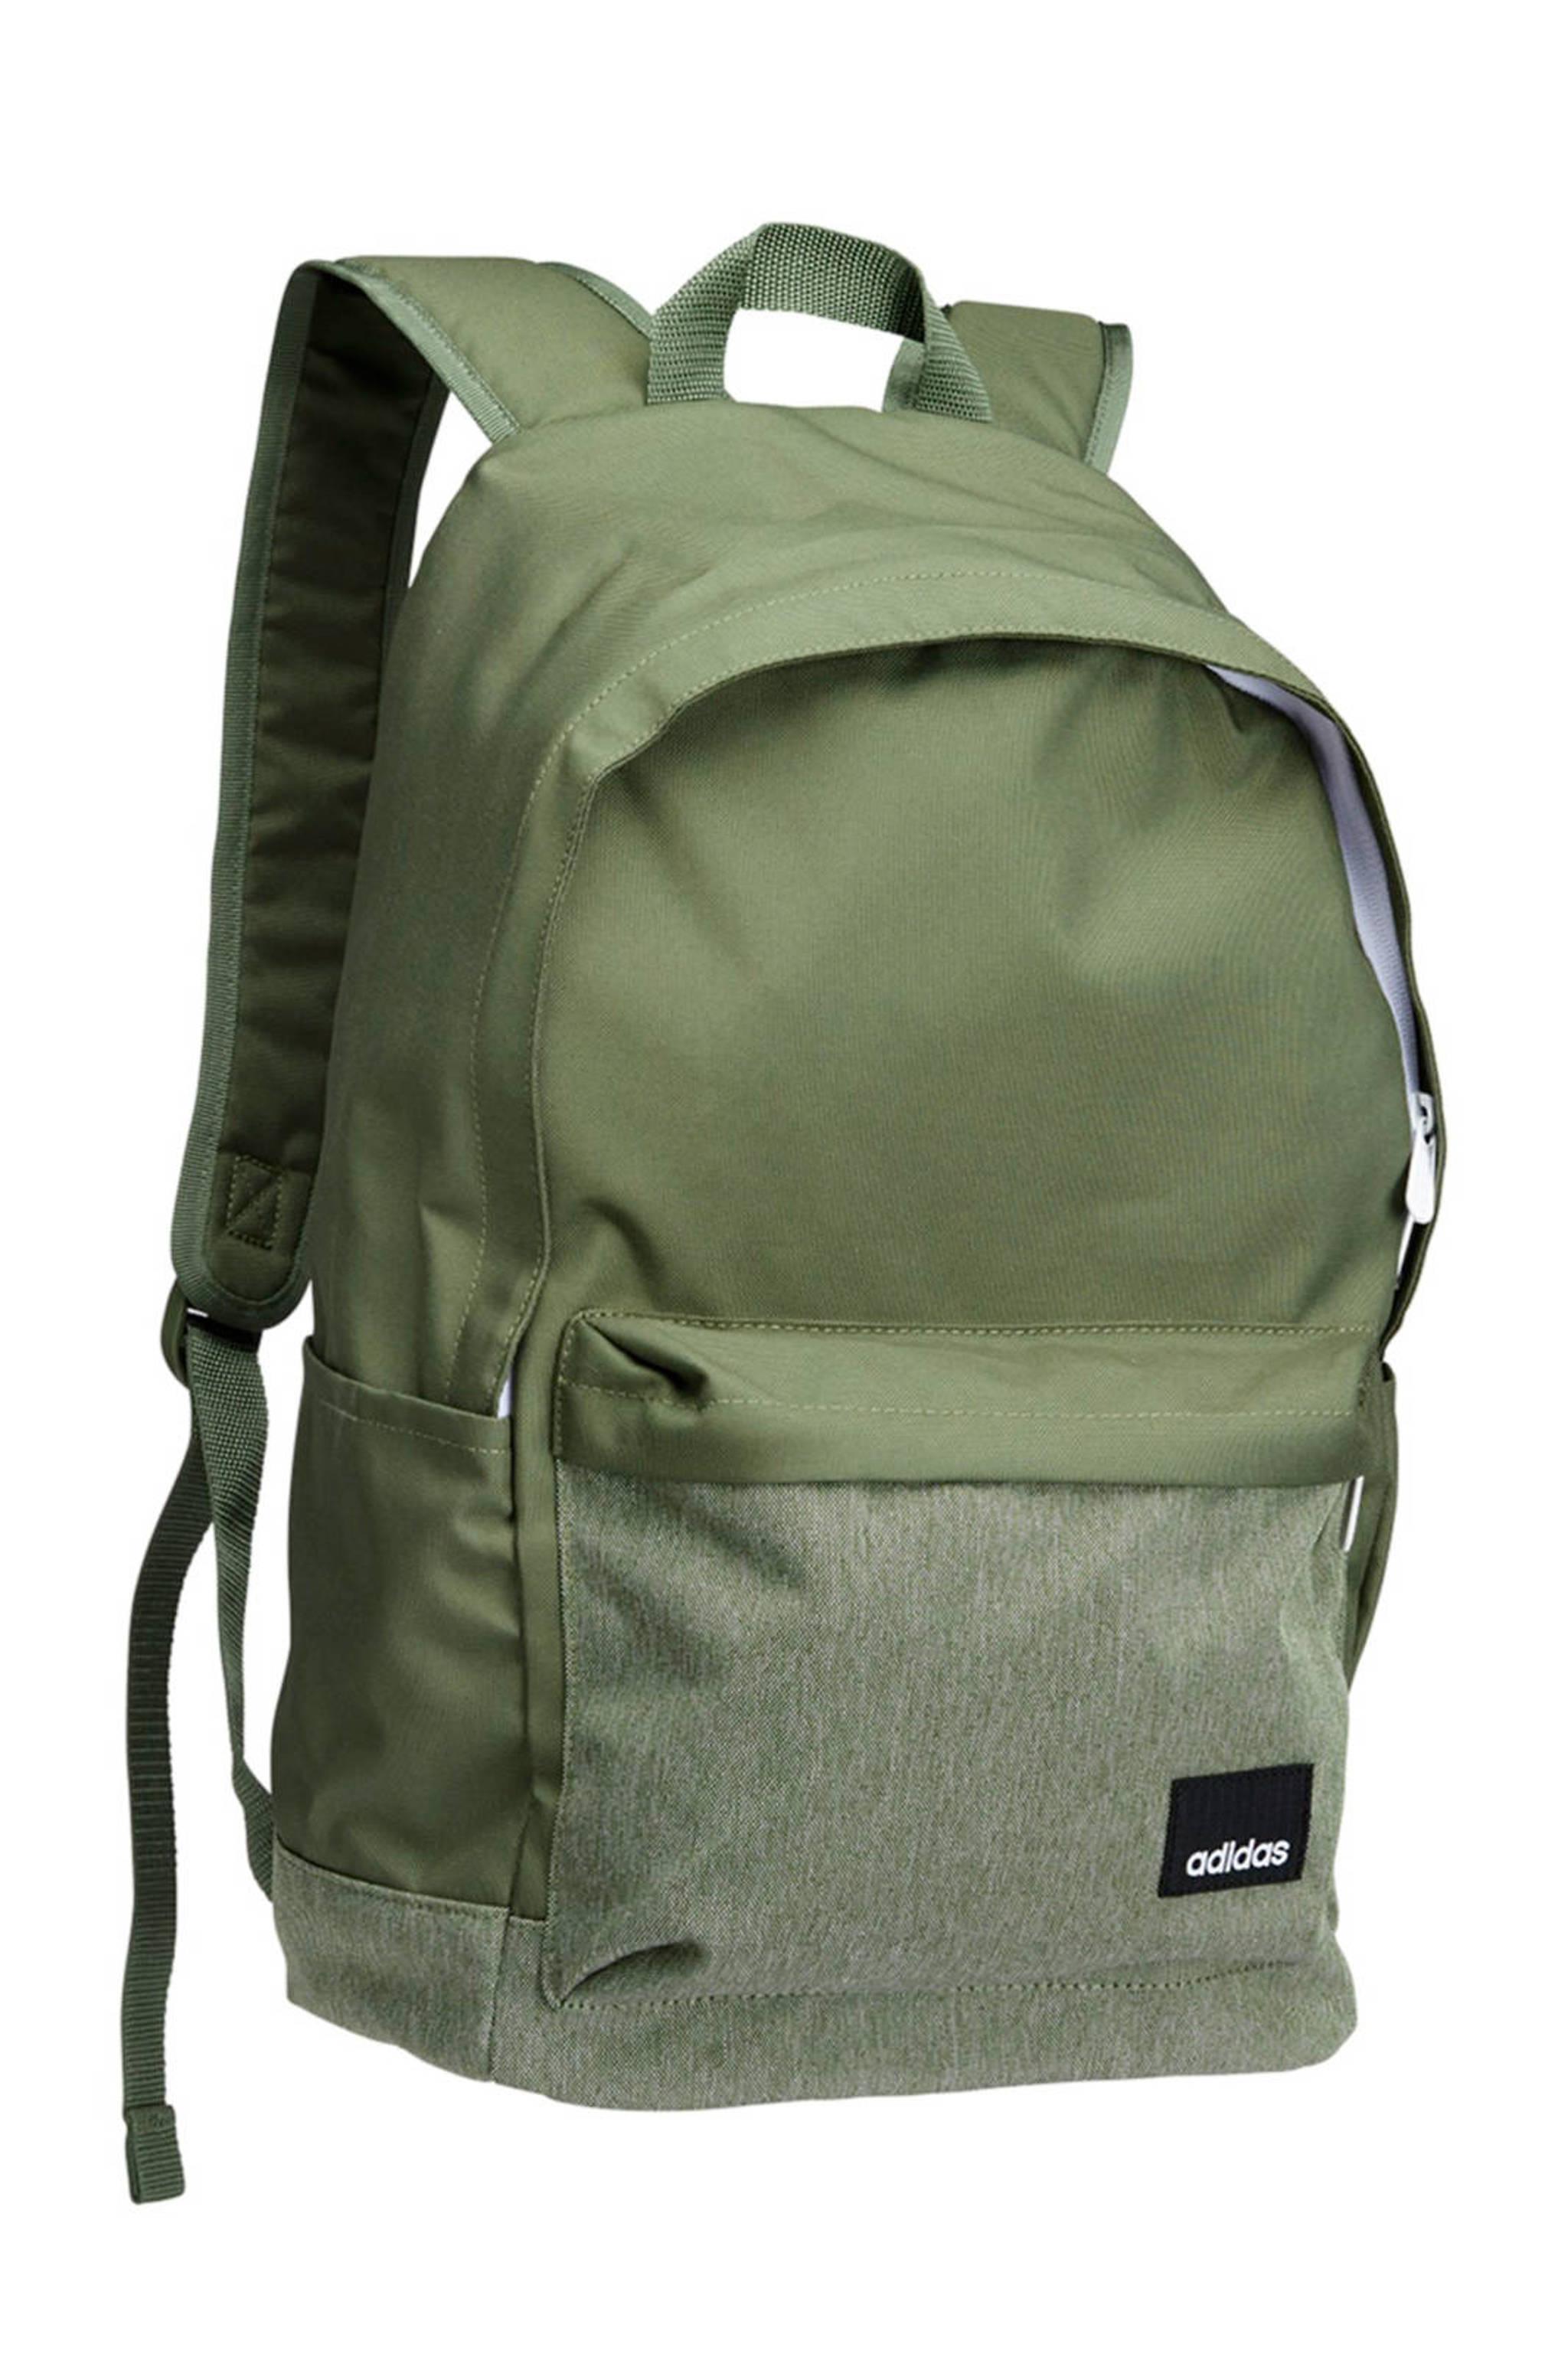 7db395cbbe7 adidas rugzak groen | wehkamp